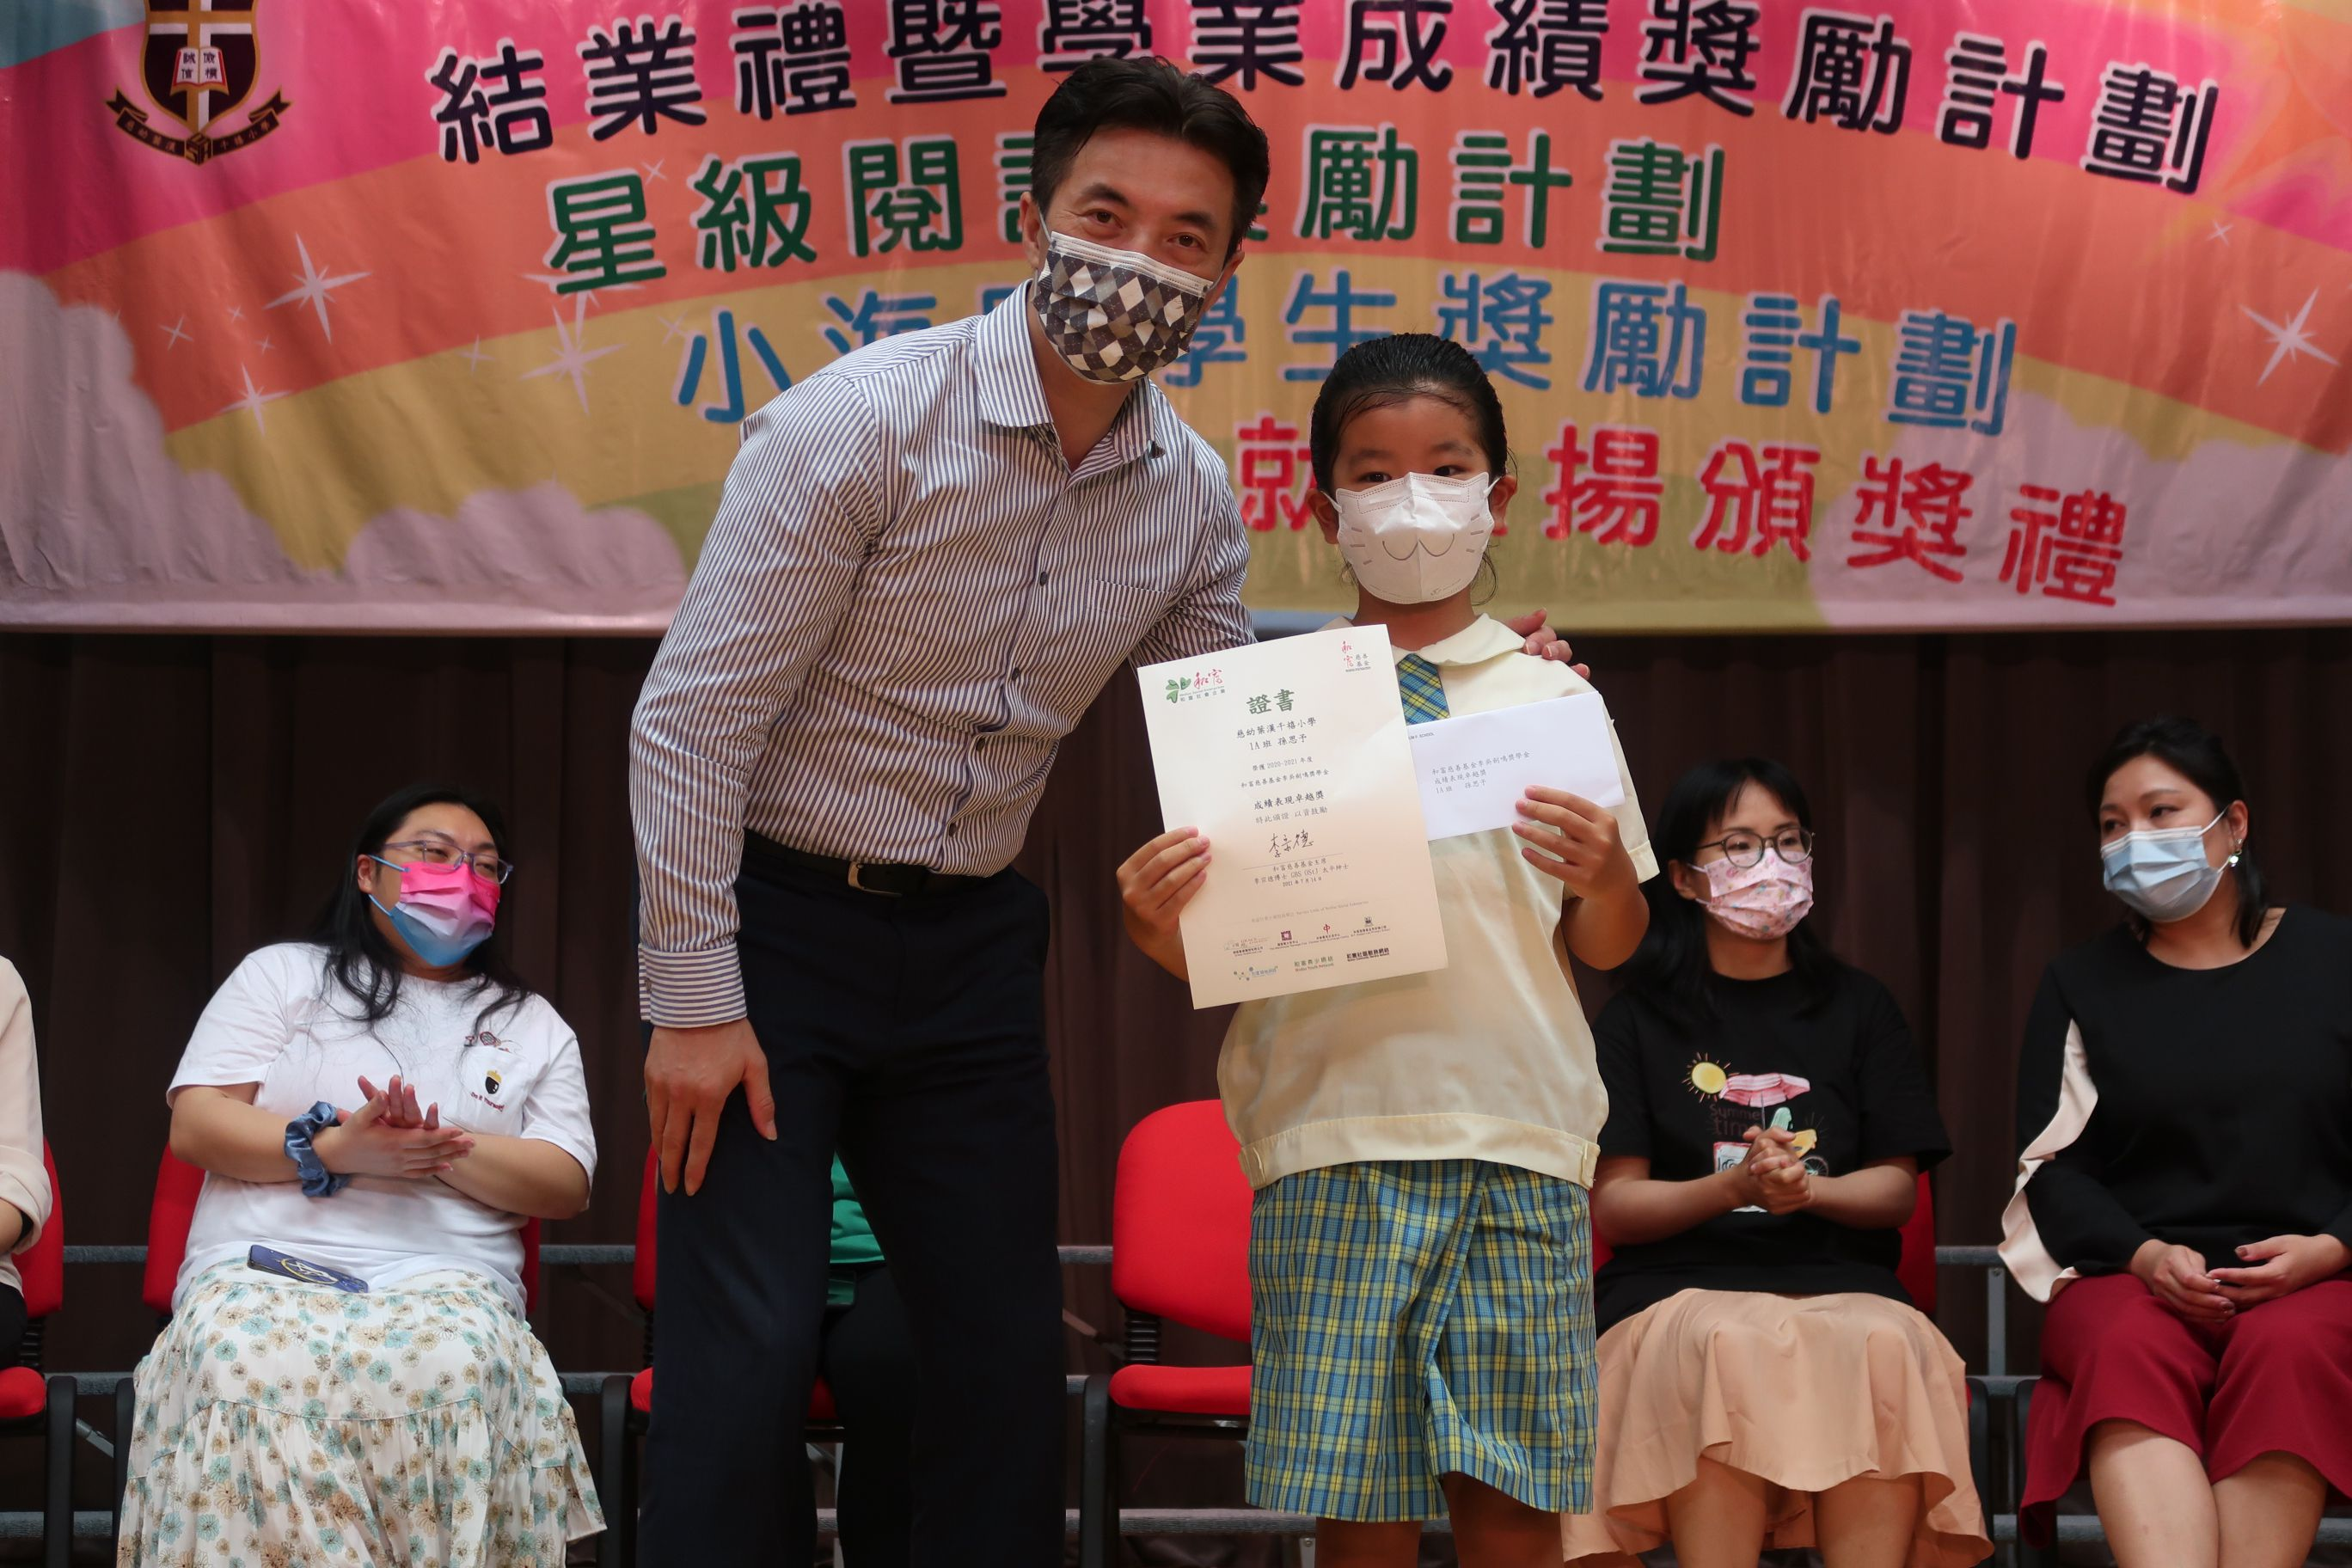 https://syh.edu.hk/sites/default/files/img_5929_1.jpg